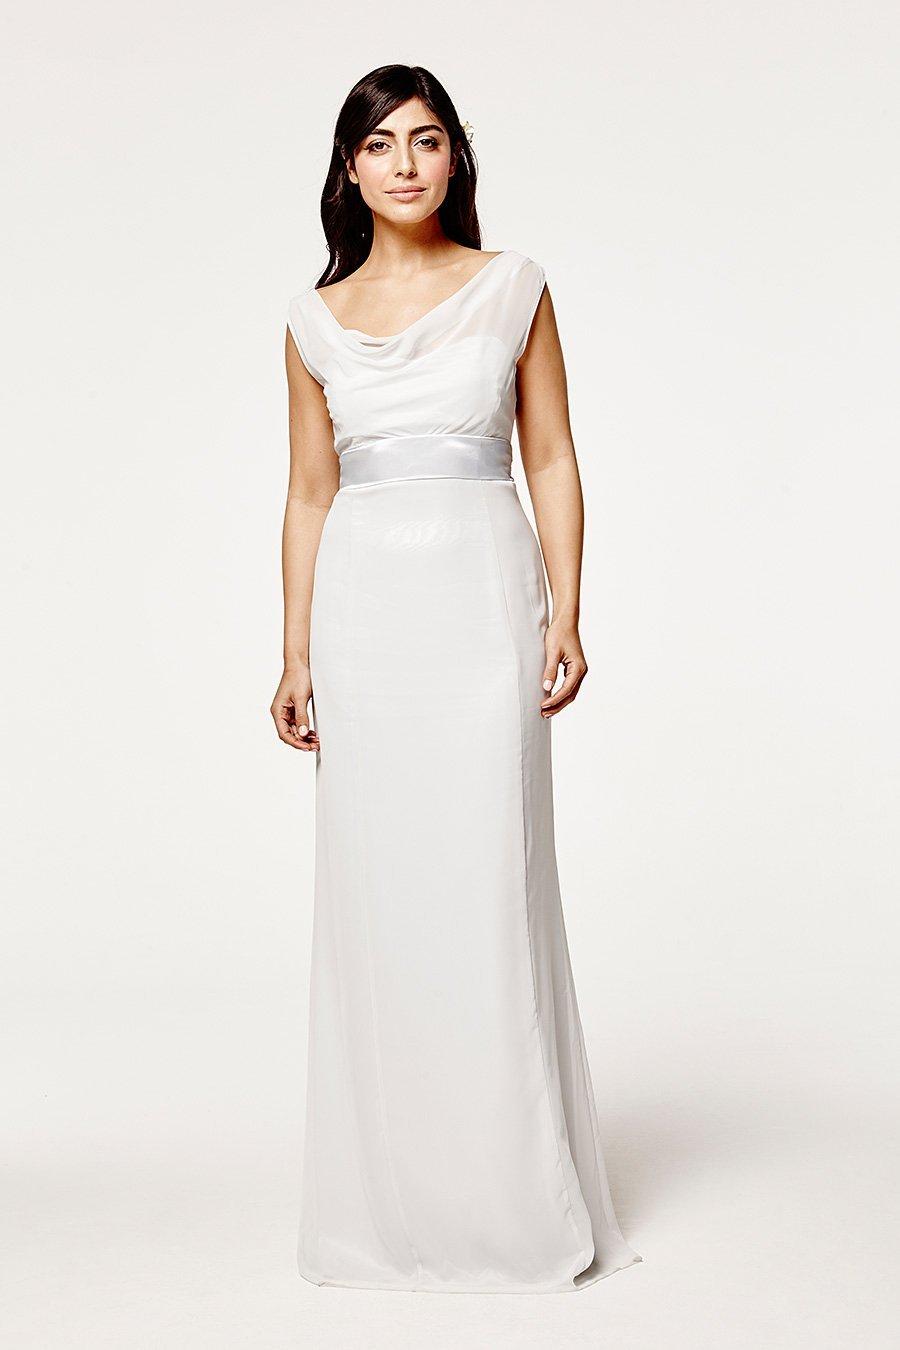 Maids to Measure Penelope Bridesmaid Dress